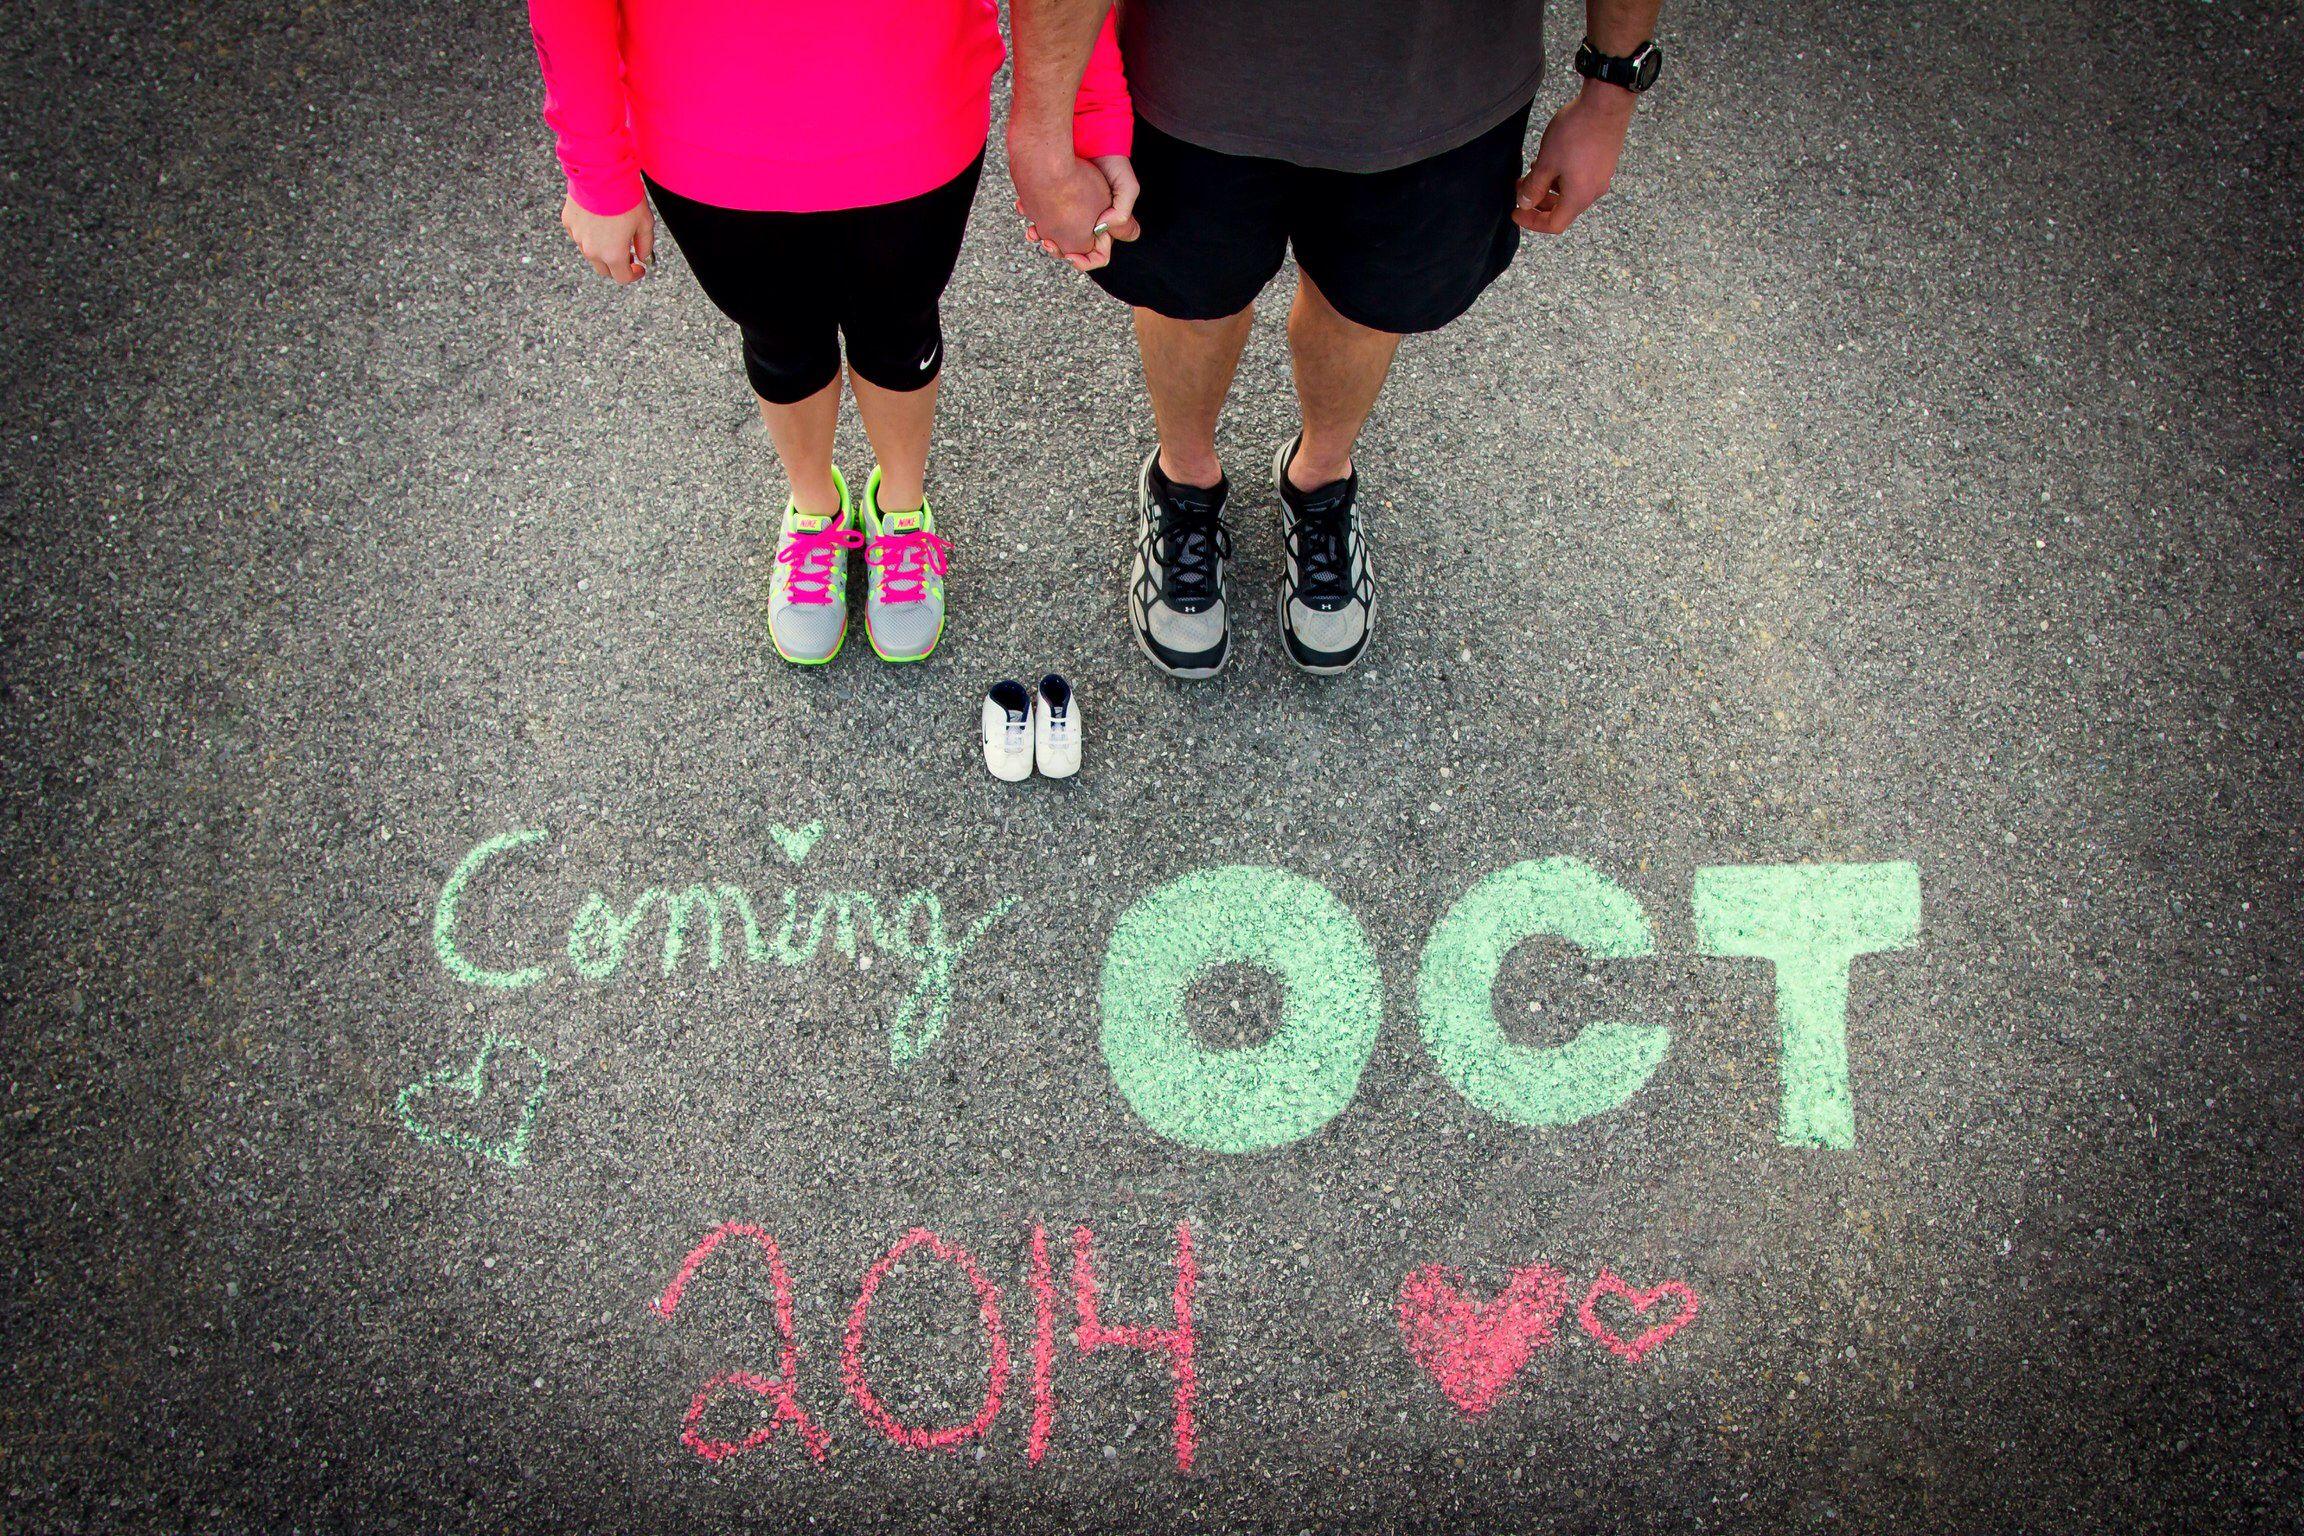 Pregnancy announcement  photo credit @Kasi Jorgesen Jorgesen LoRusso iHeart Moments Photography